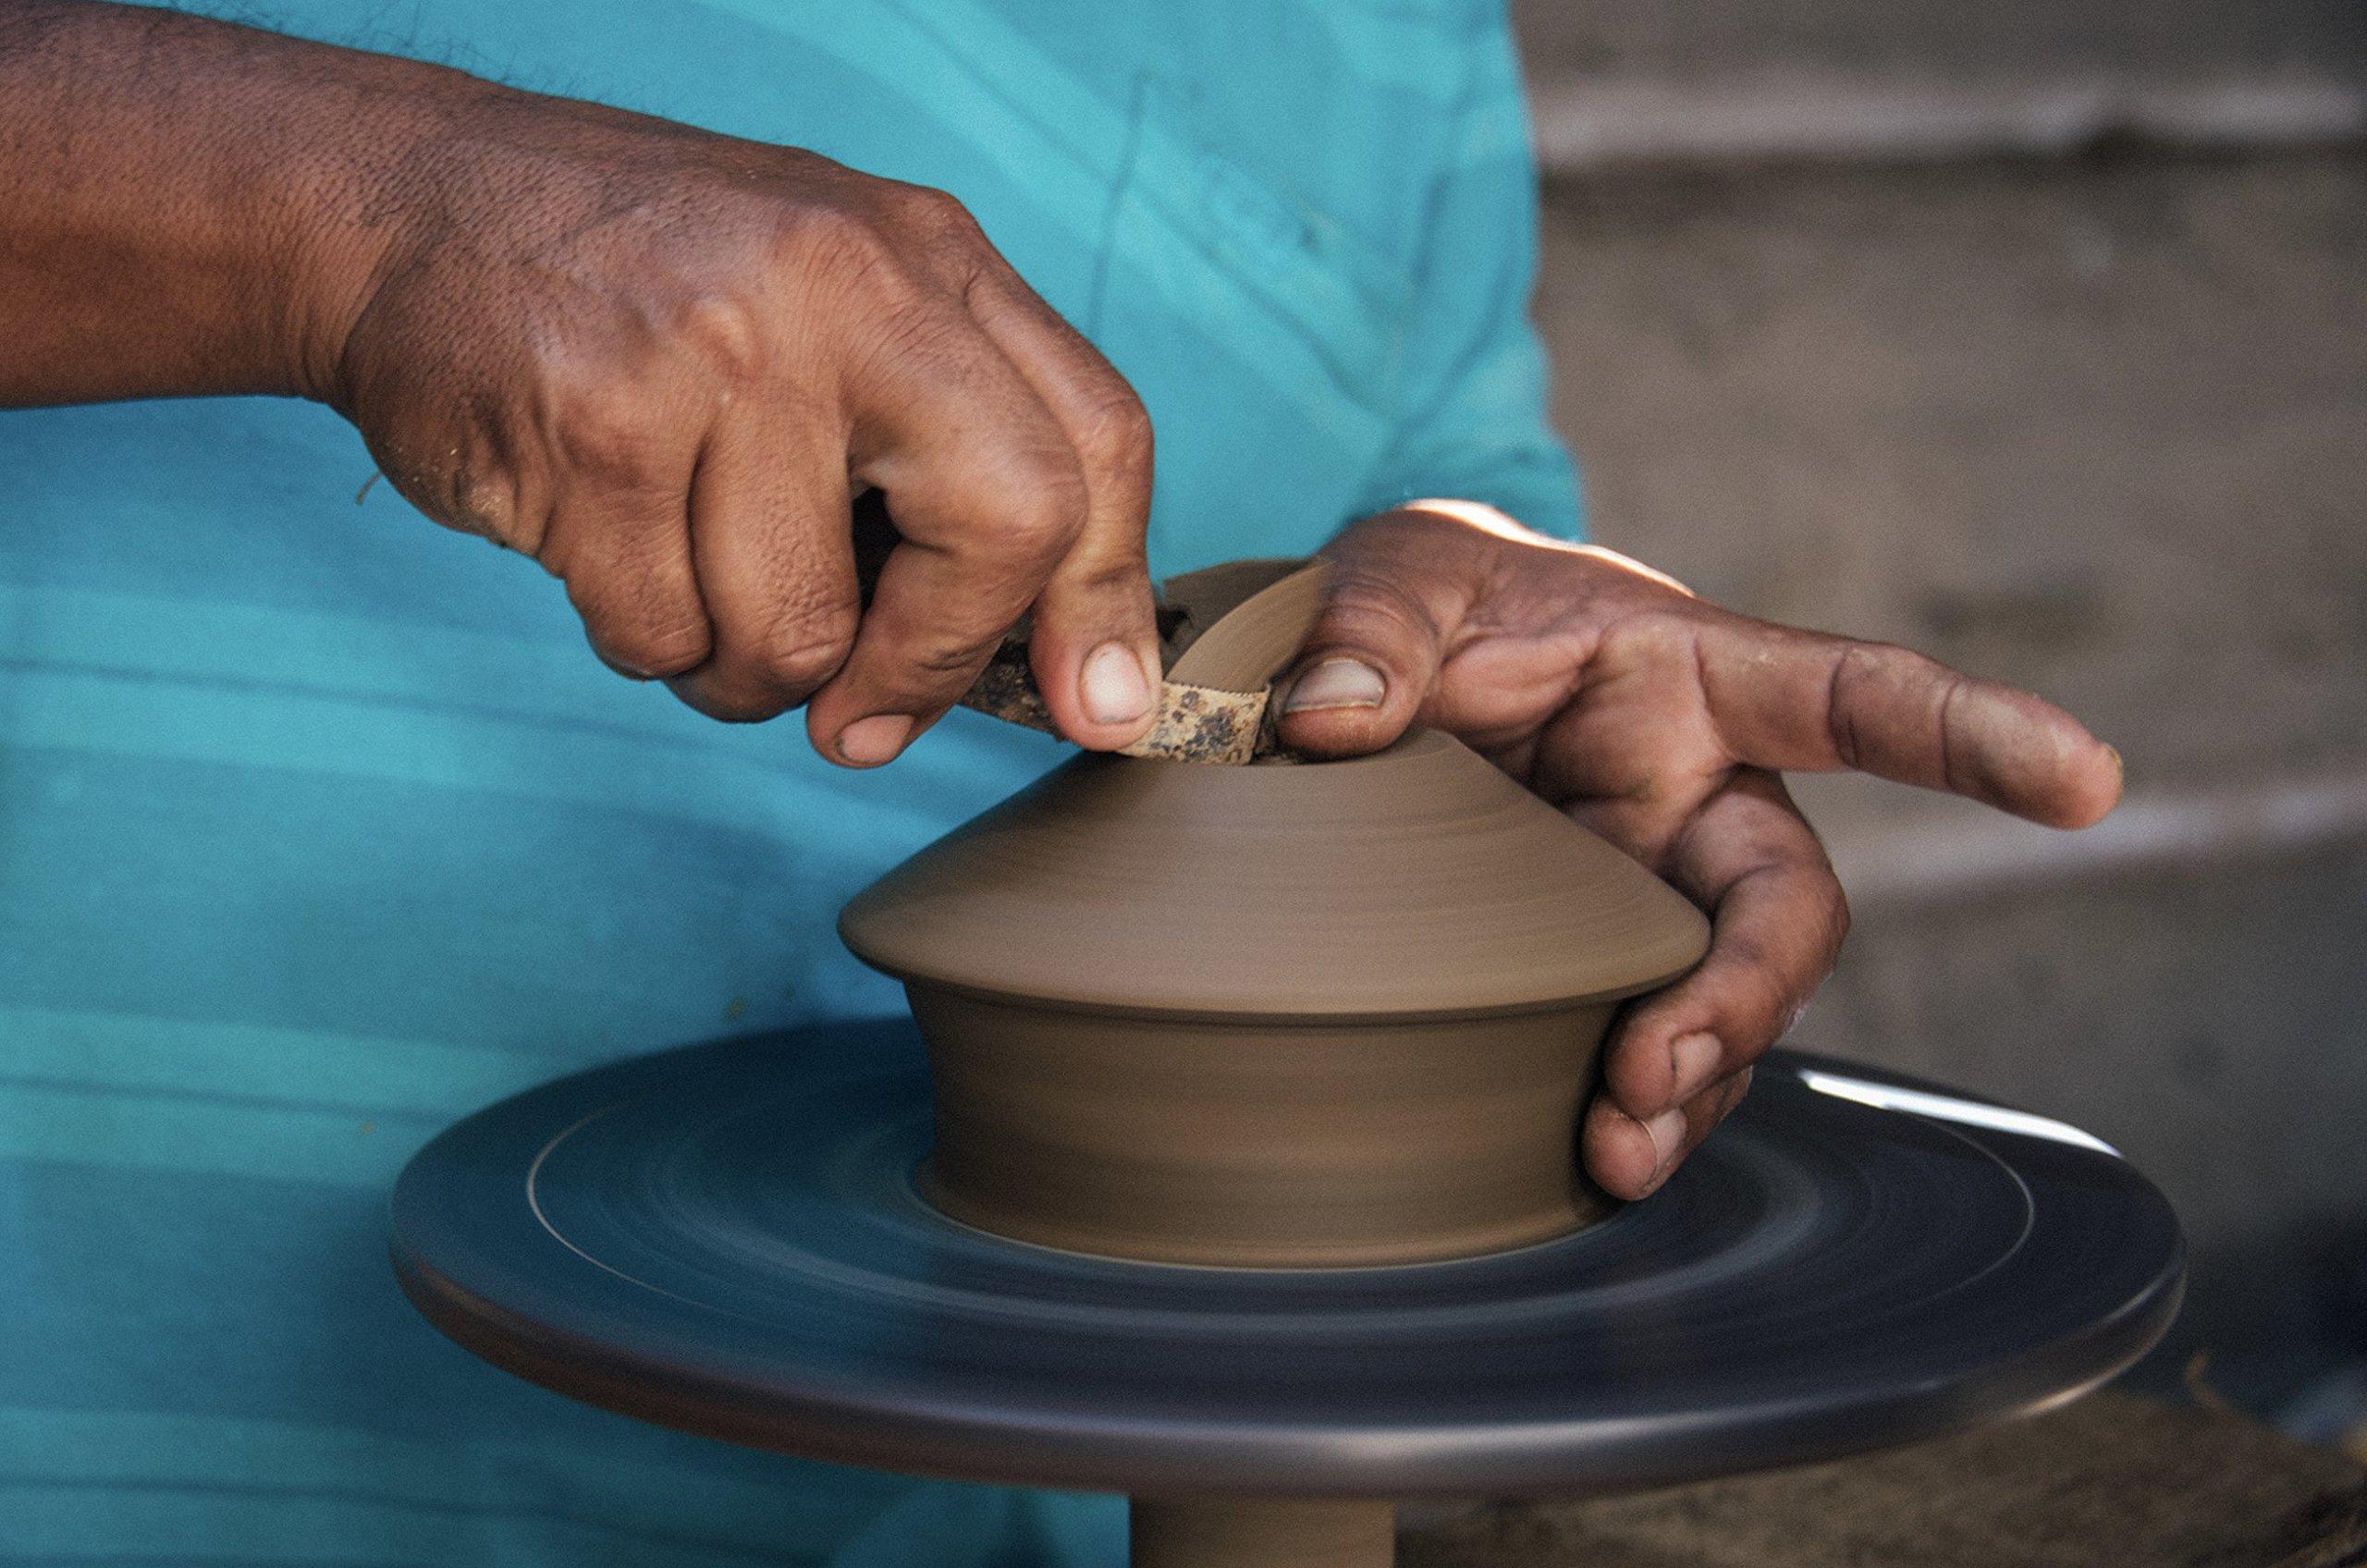 Luna Sundara Palo Santo Holder Authentic Chulucanas Peru Pottery (Green) 5 Palo Santo Sticks Included by Luna Sundara (Image #4)